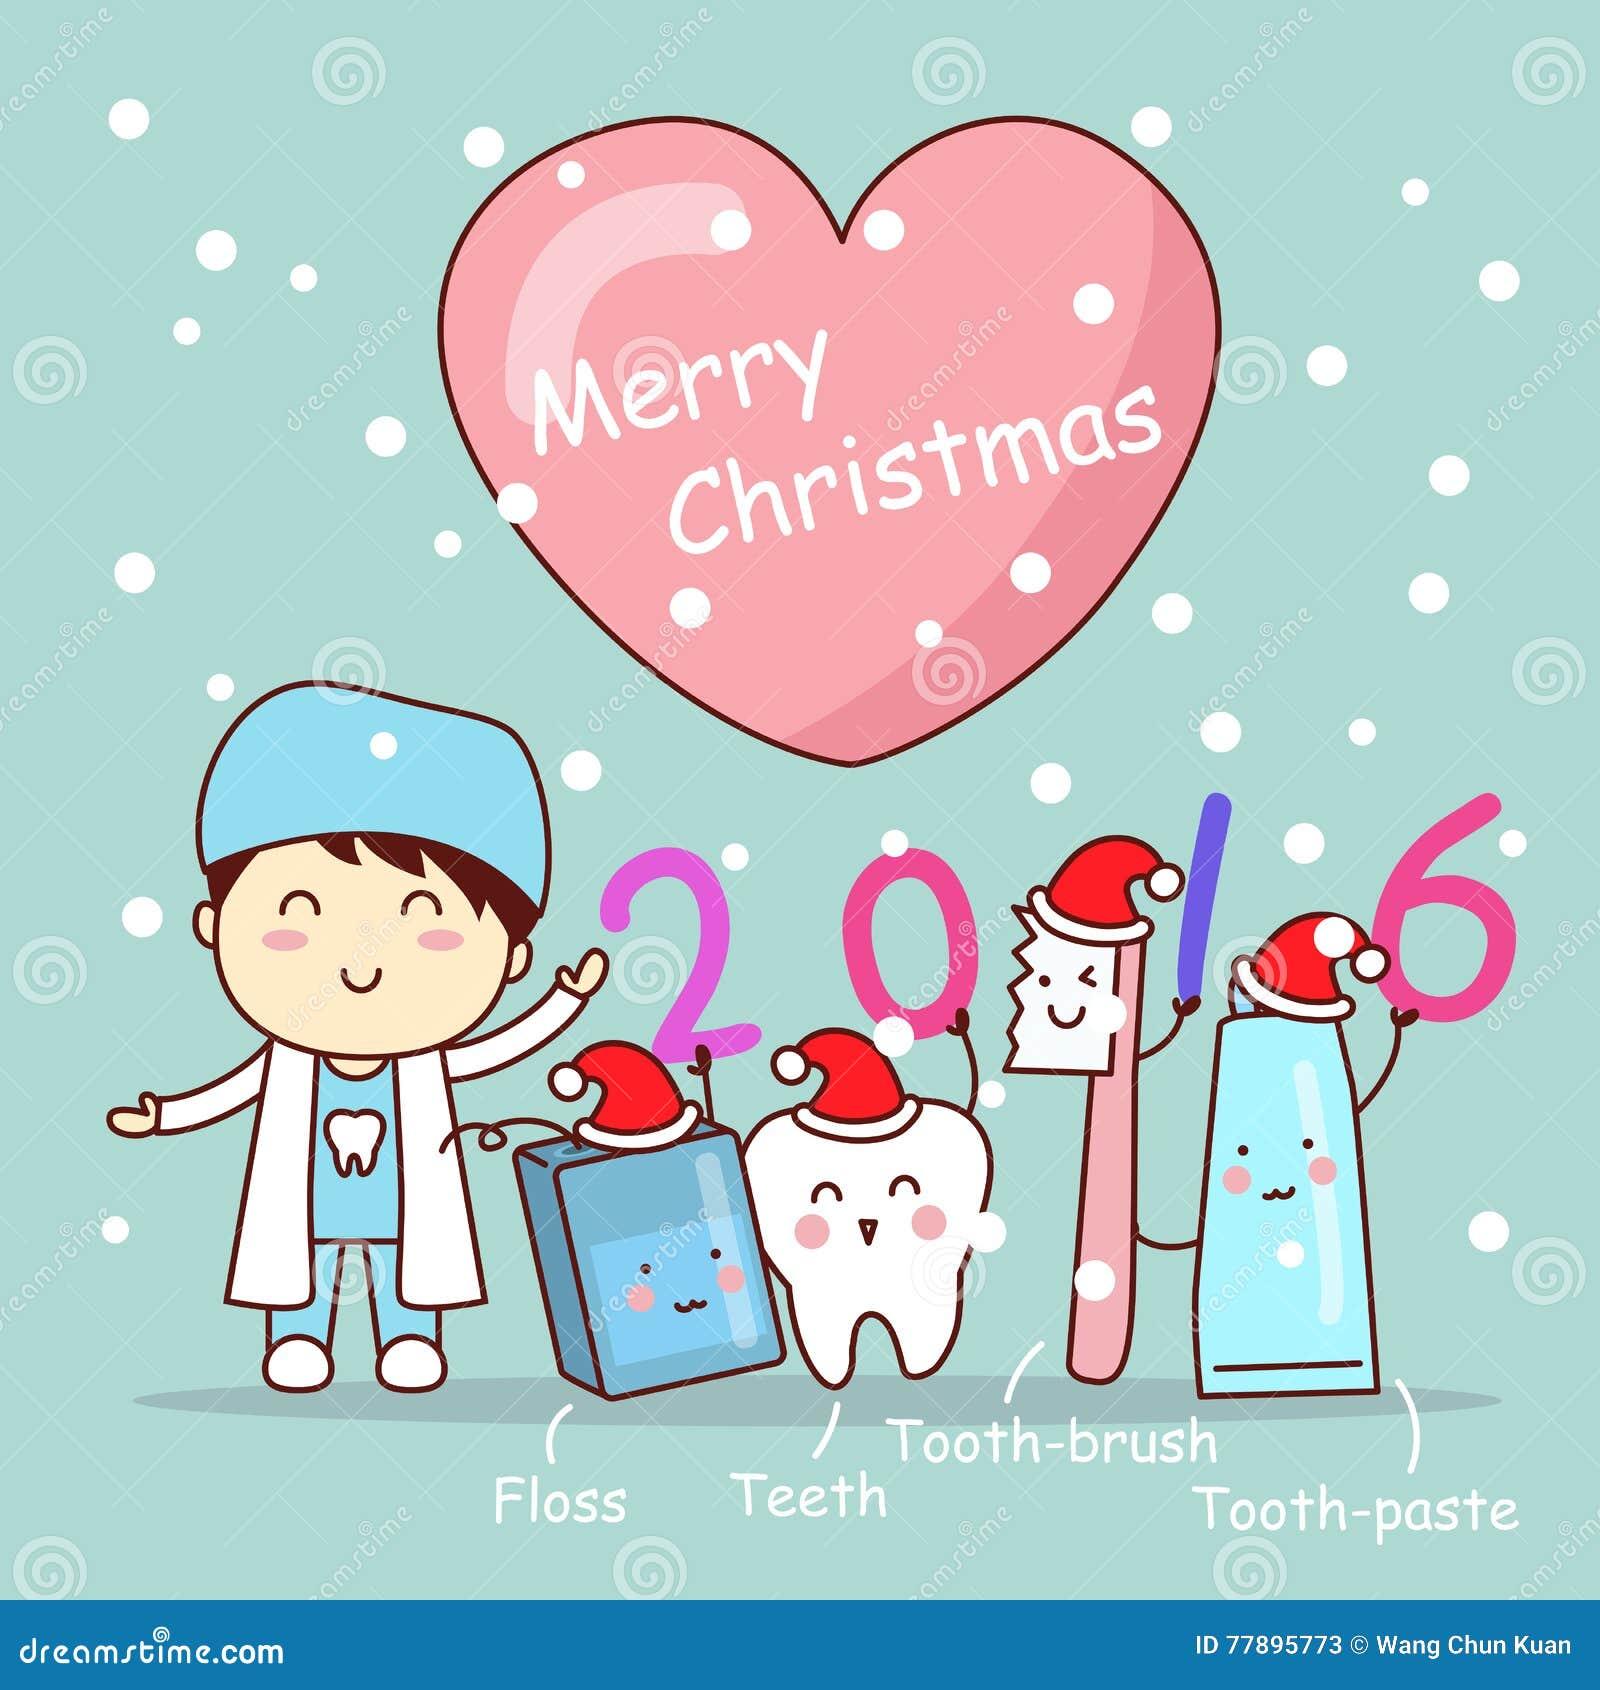 Christmas And Cute Cartoon Dentist Stock Vector - Image: 77895773